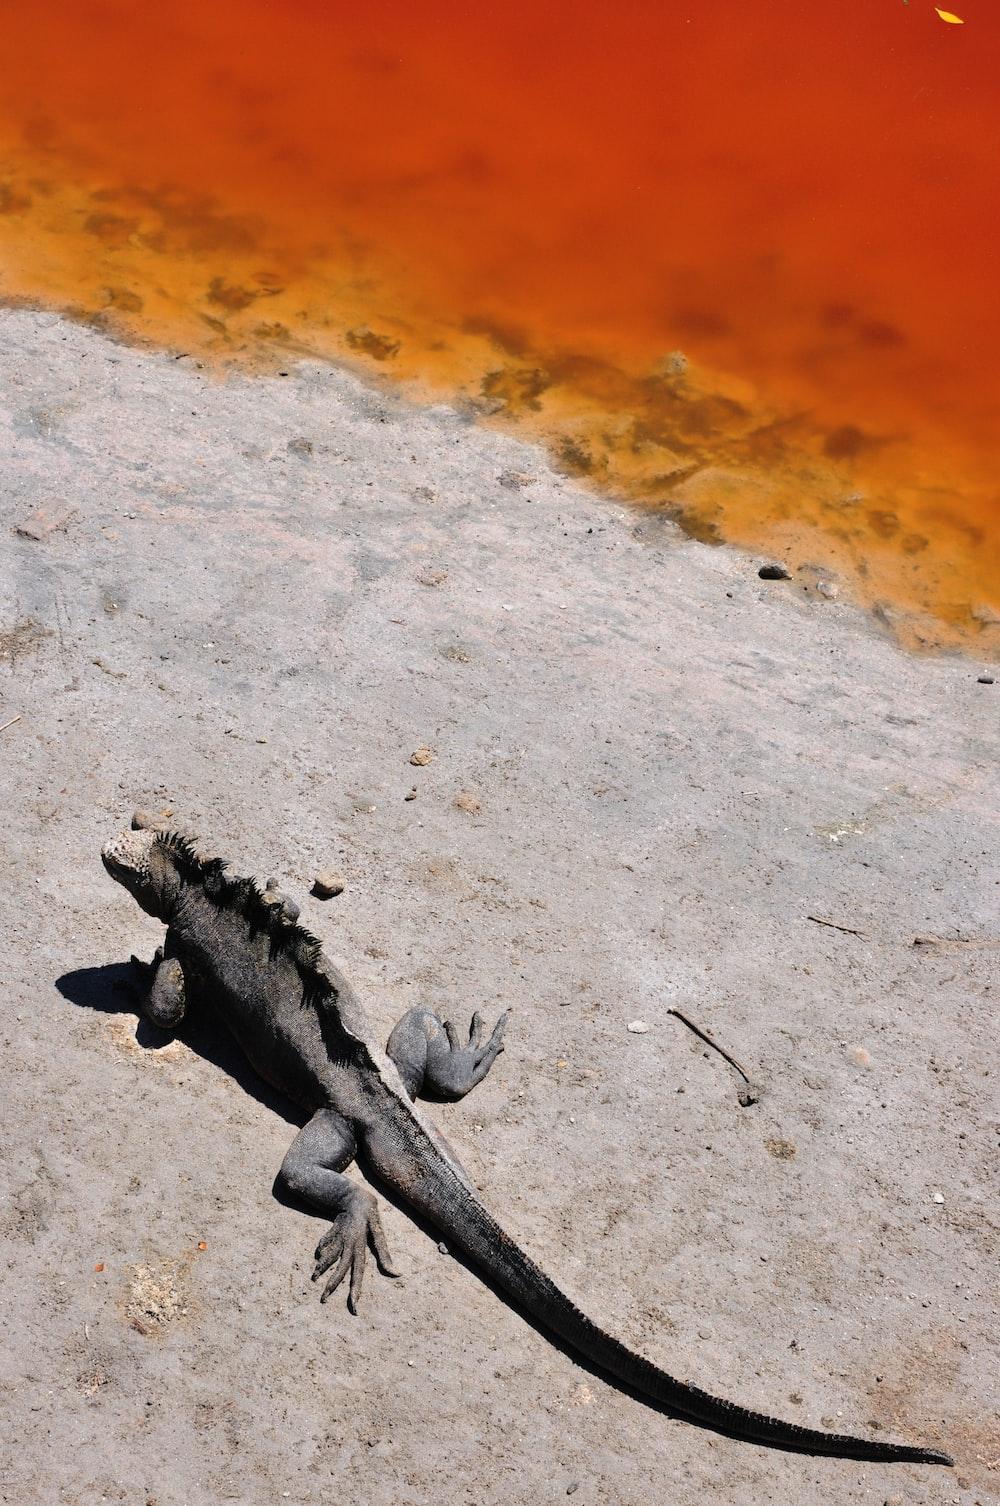 gray and black iguana on brown sand